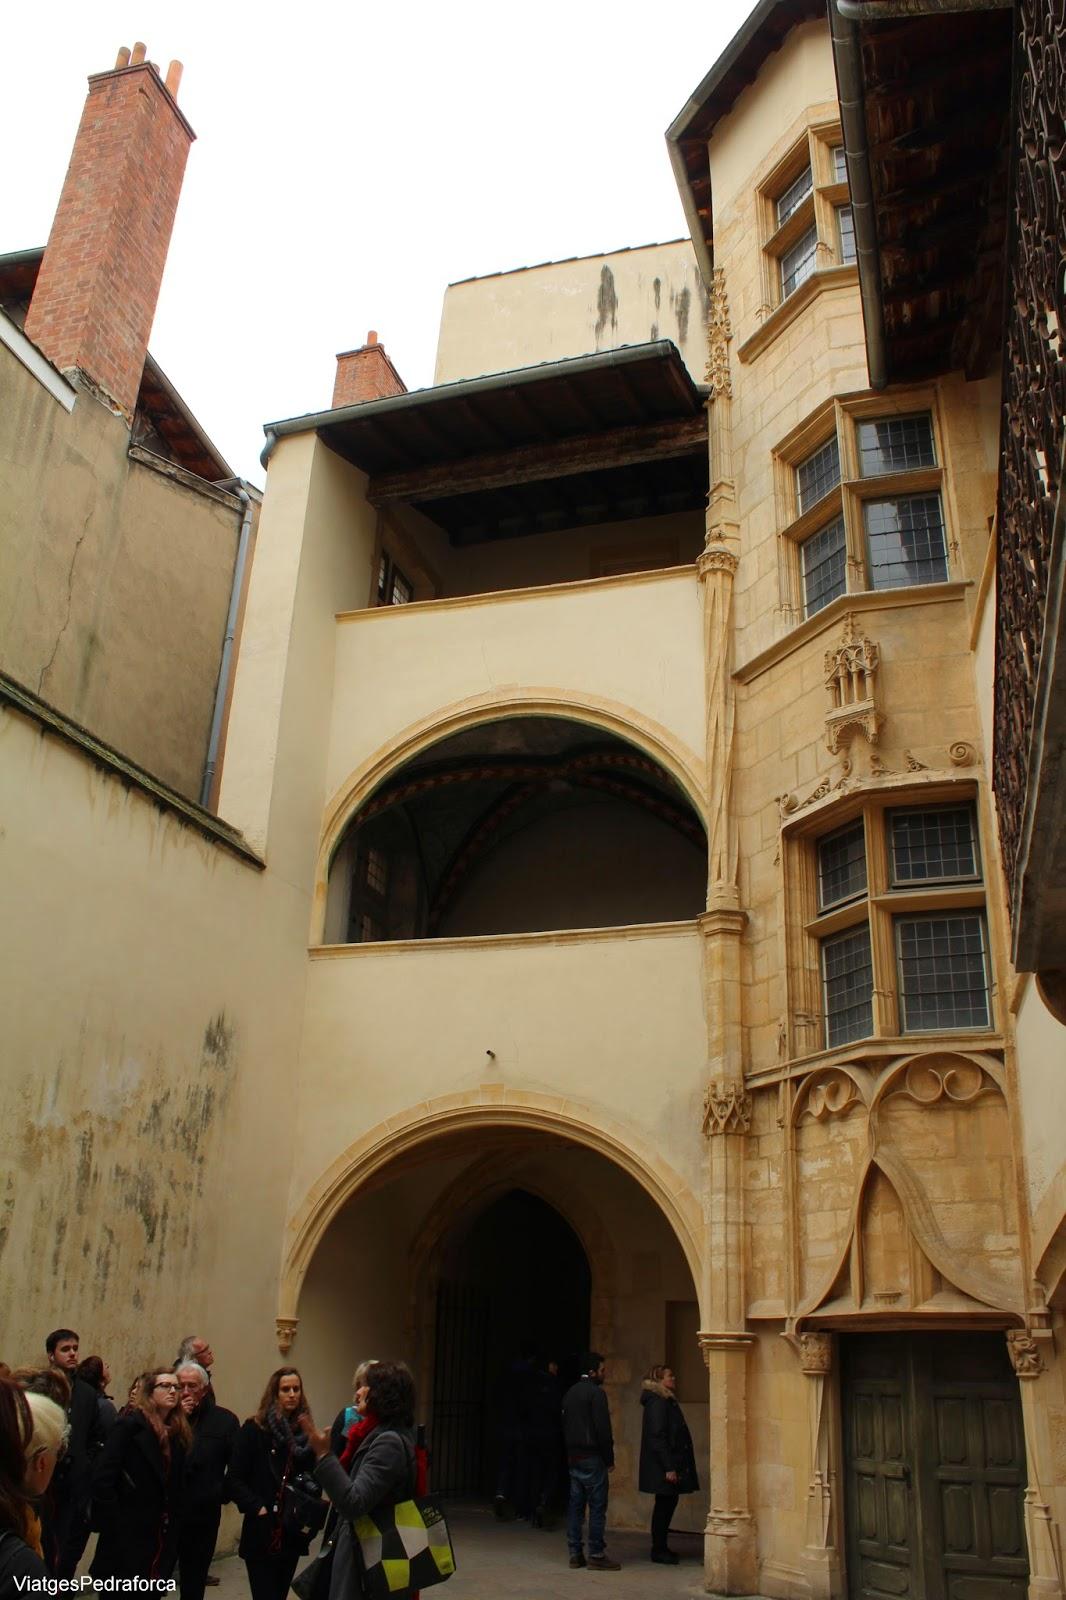 Traboule Vieux Lyon, Lió, Rhône-Alpes, França, France, Unesco World Heritatge, Patrimoni de la Humanitat